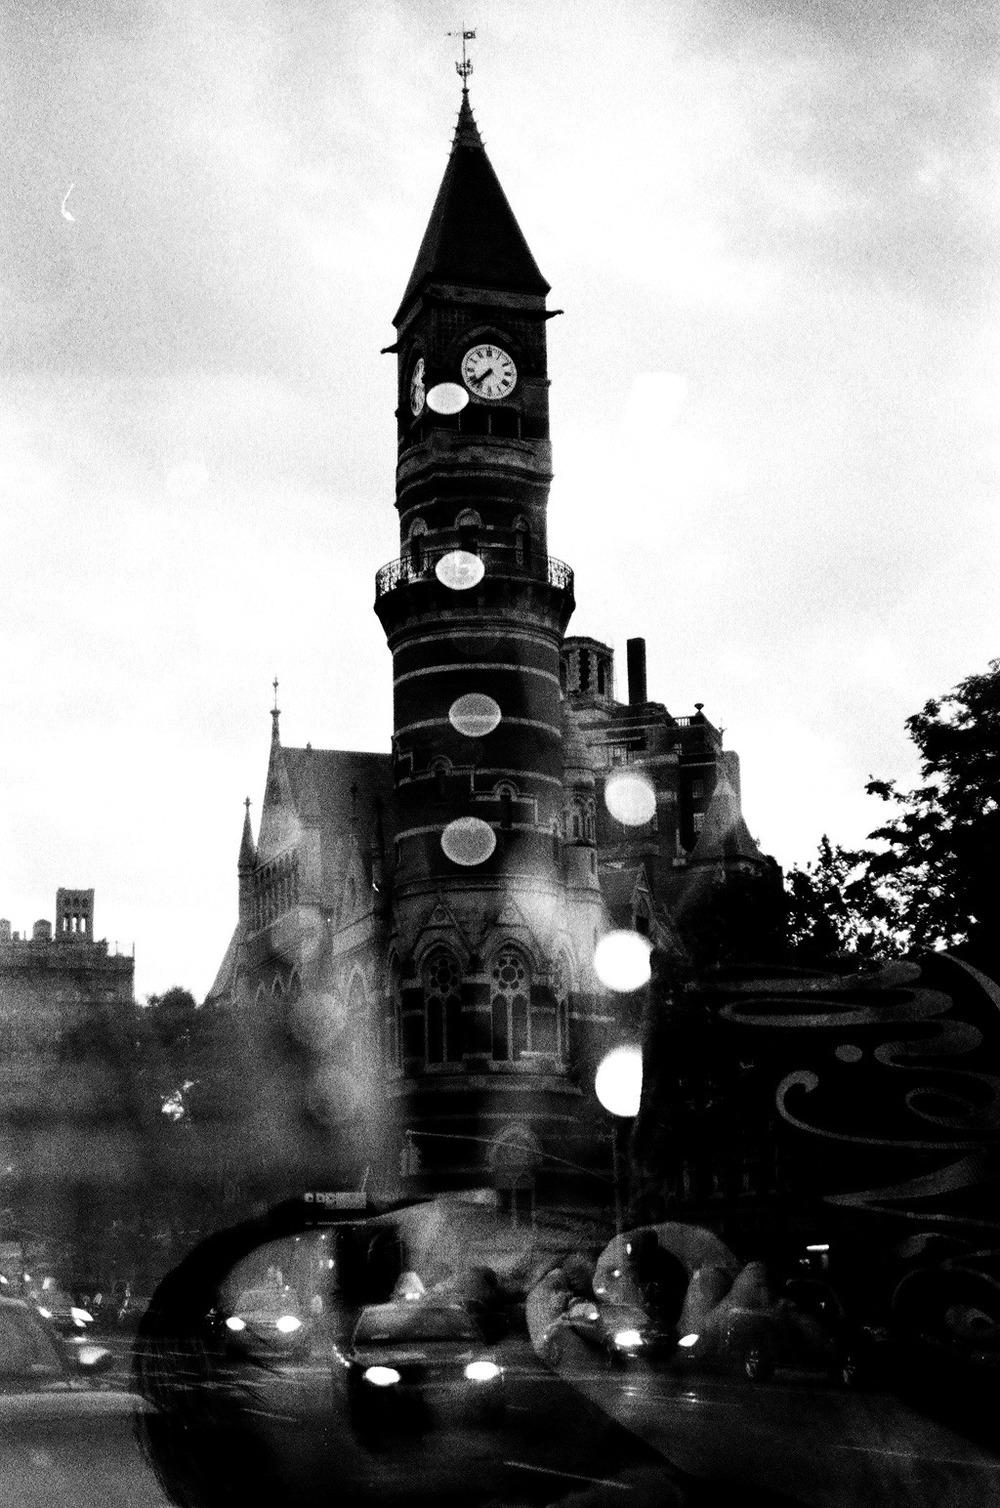 clock tower & thomas. new york city. august 2012. #Kodak #t-max #400